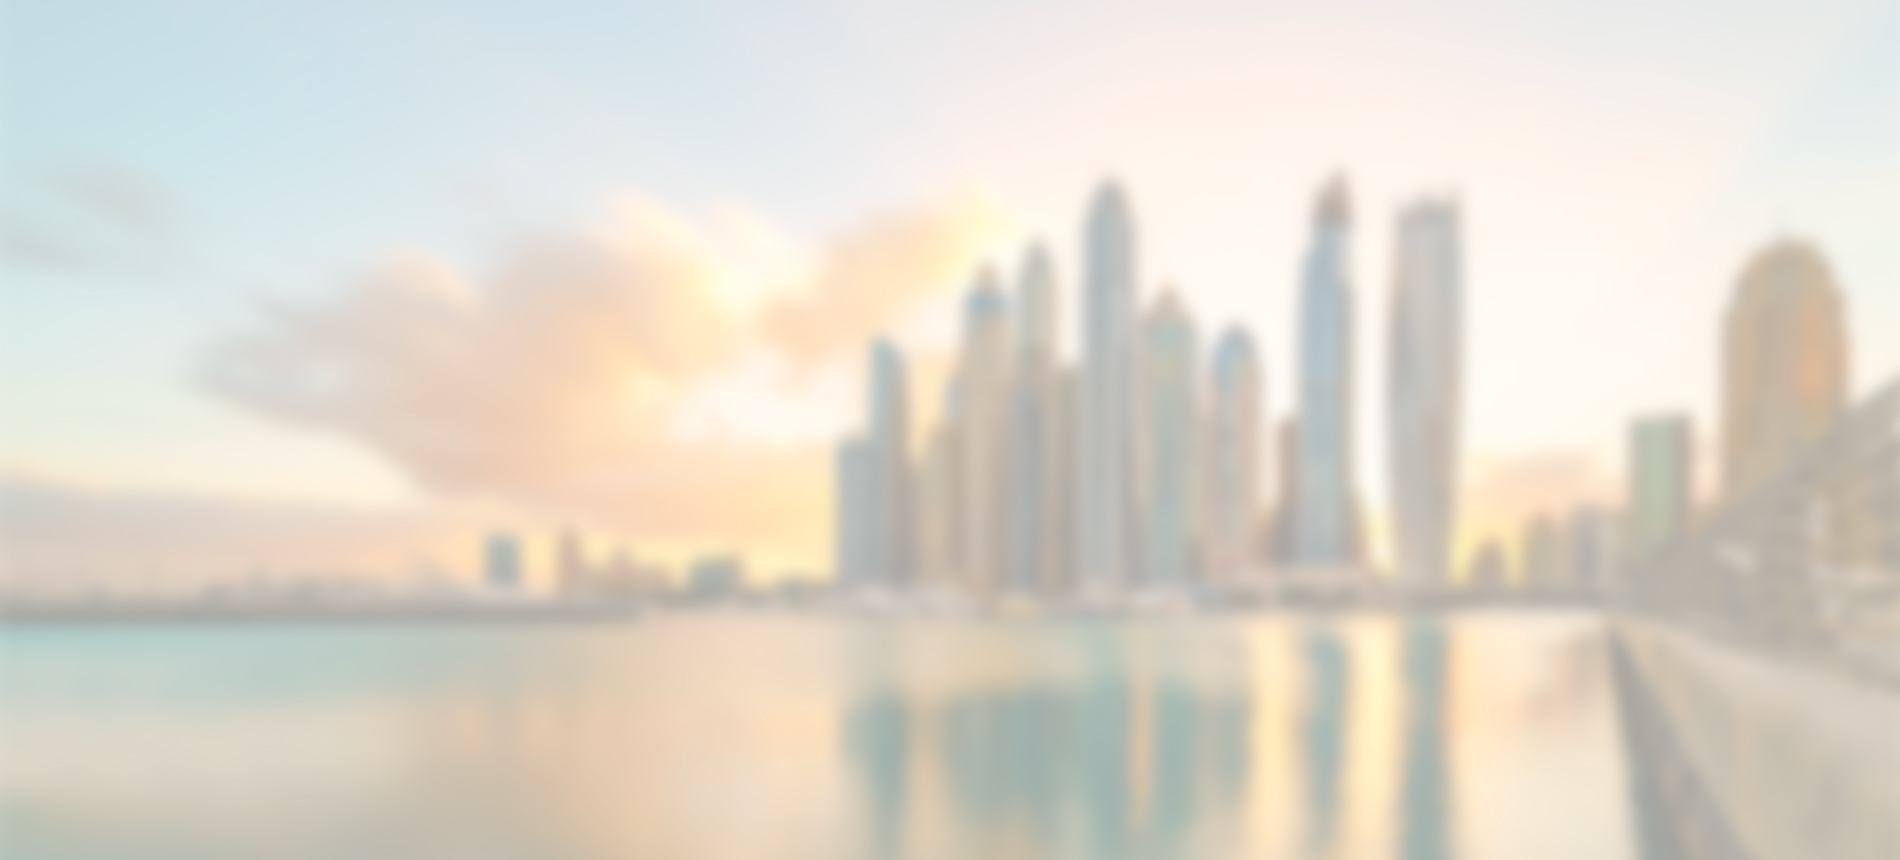 Alpha Lloyds - A leading insurance broker in the UAE